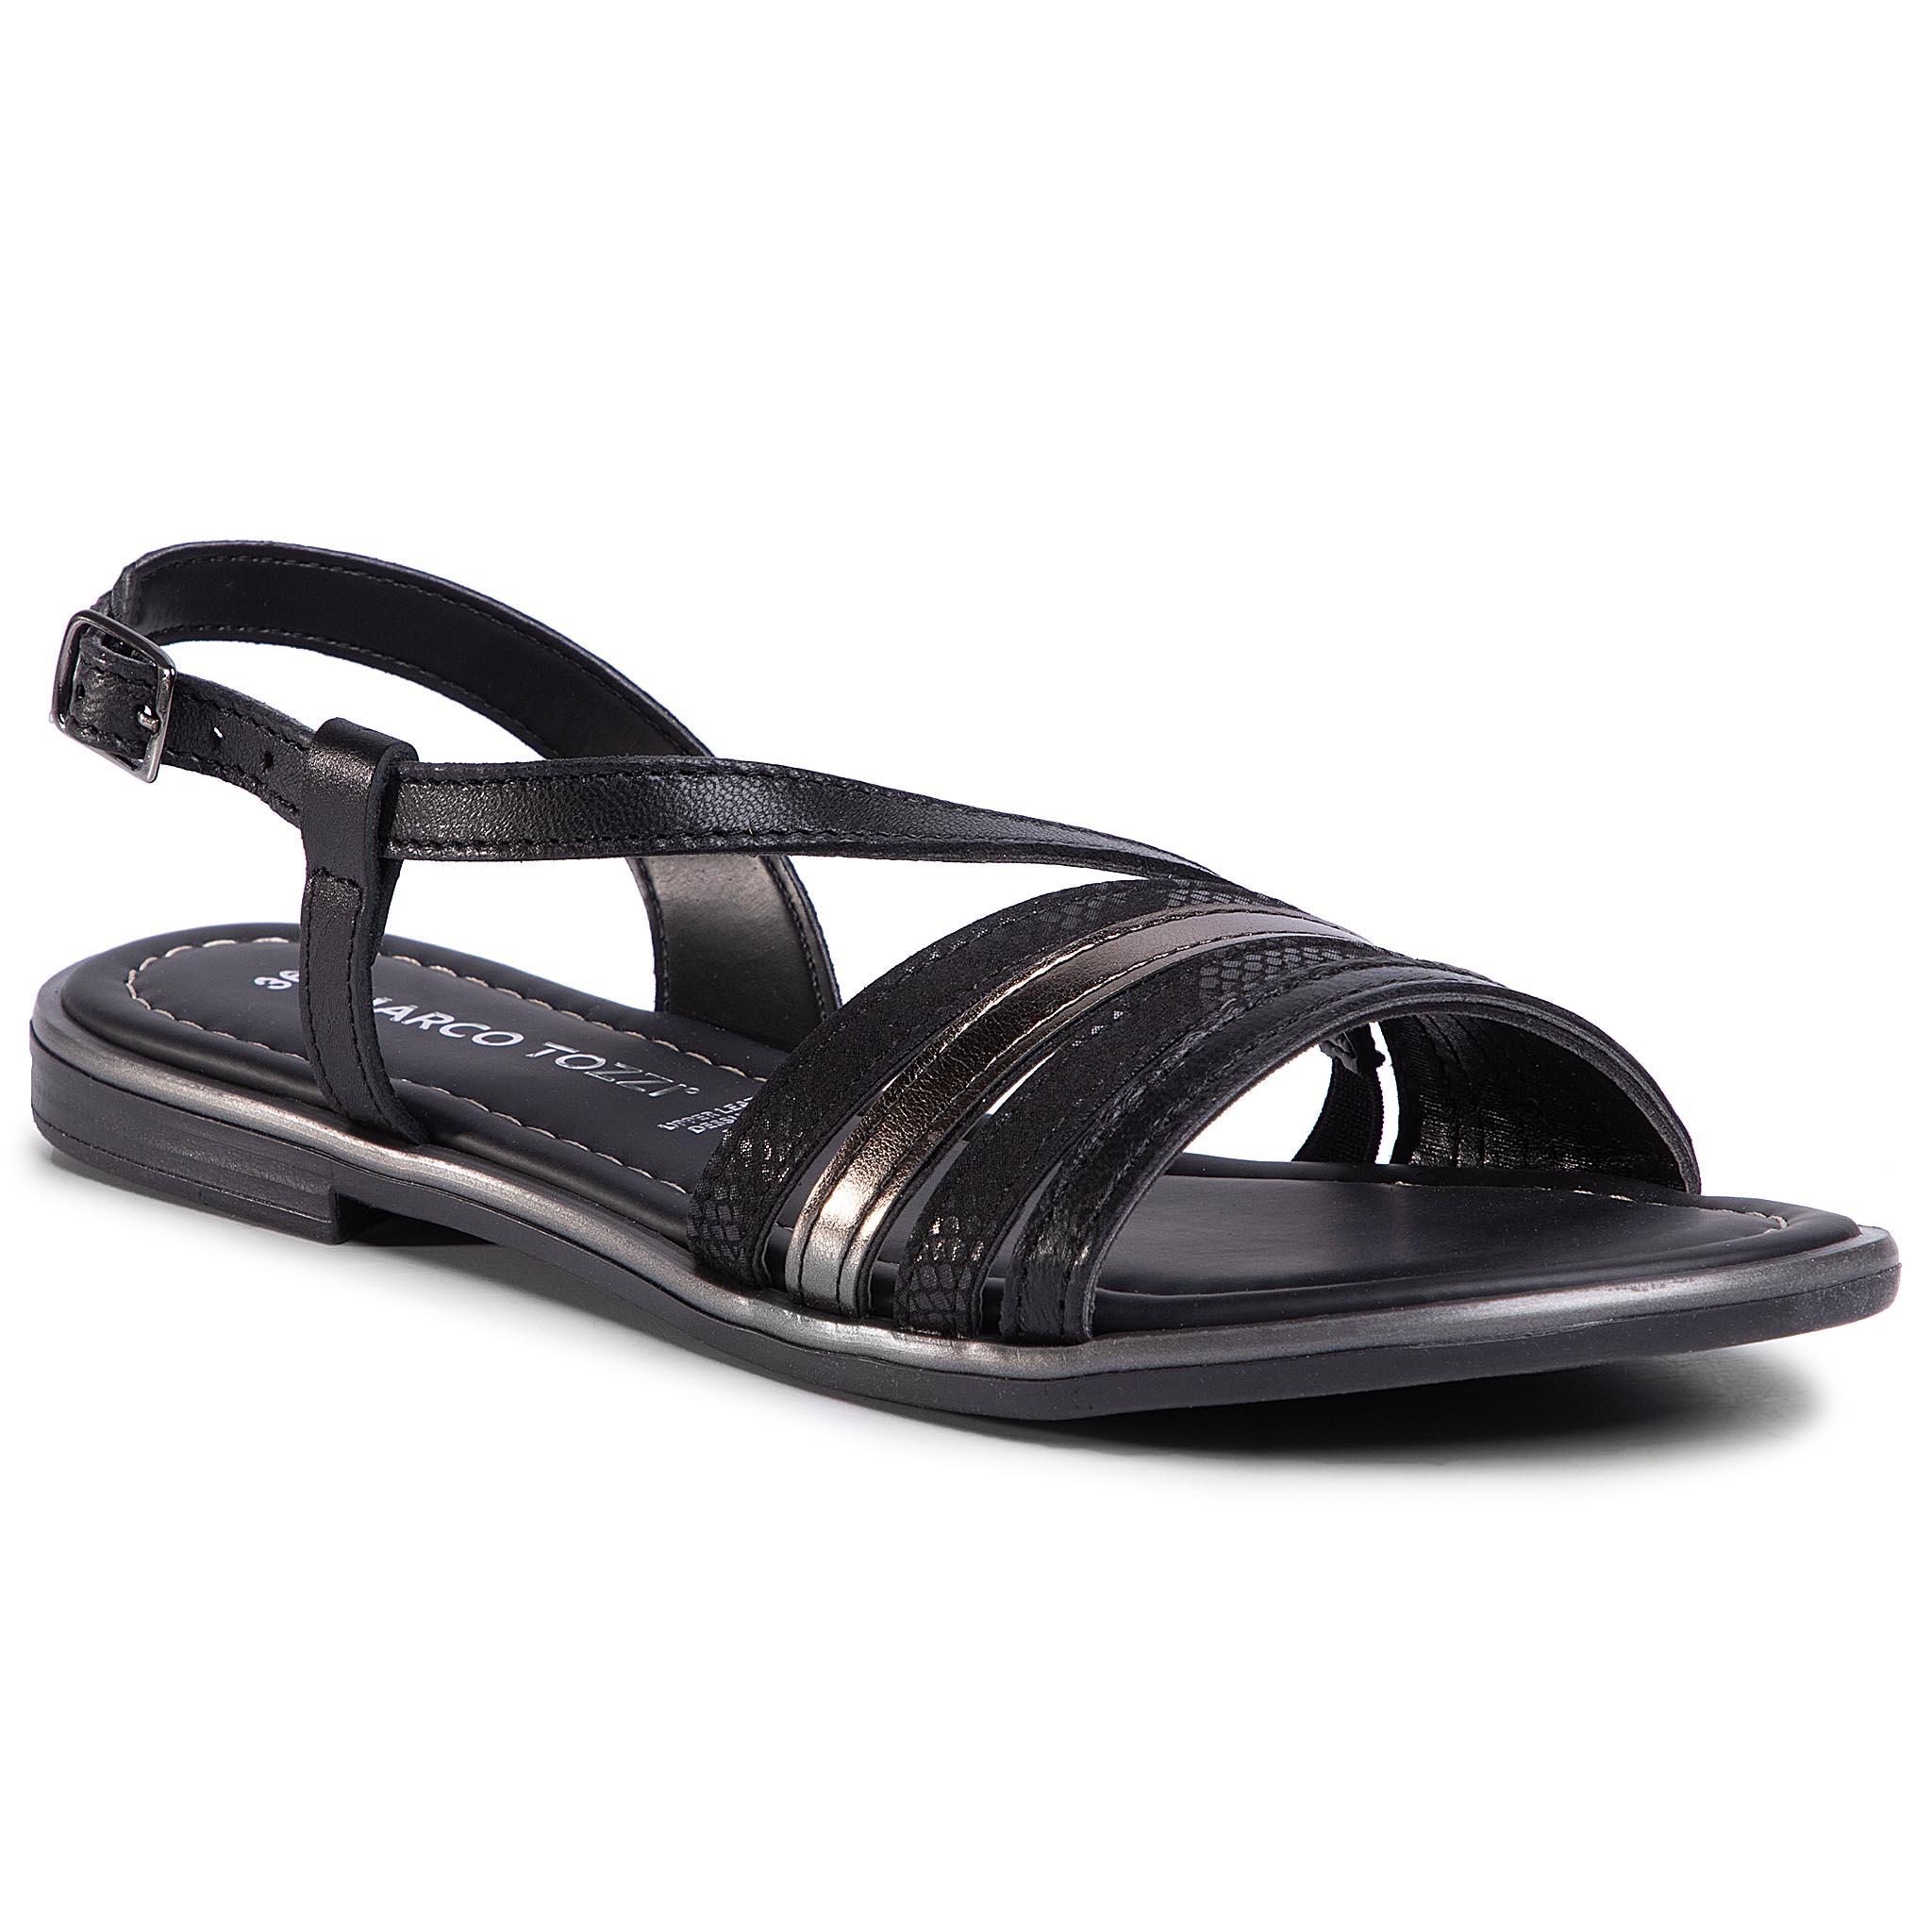 Sandále MARCO TOZZI - 2-28143-24 Black Comb 098